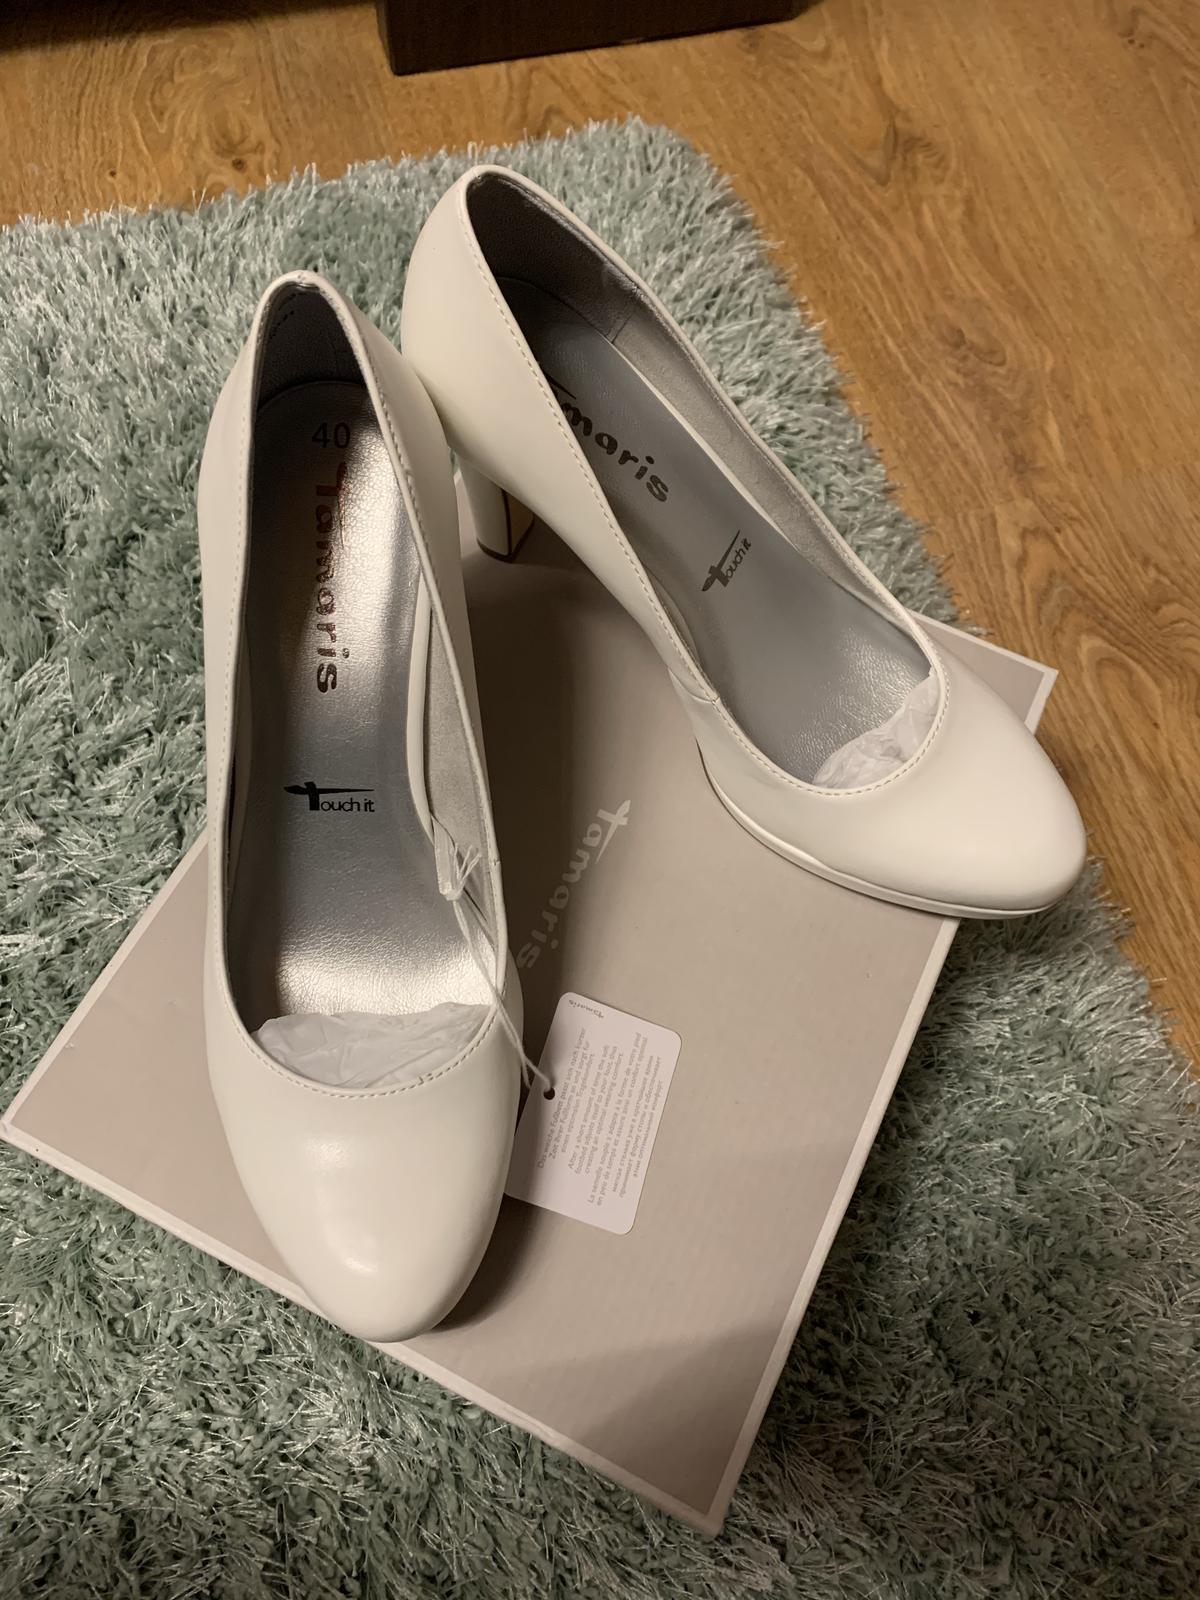 Svadobné topánky Tamaris - Obrázok č. 3